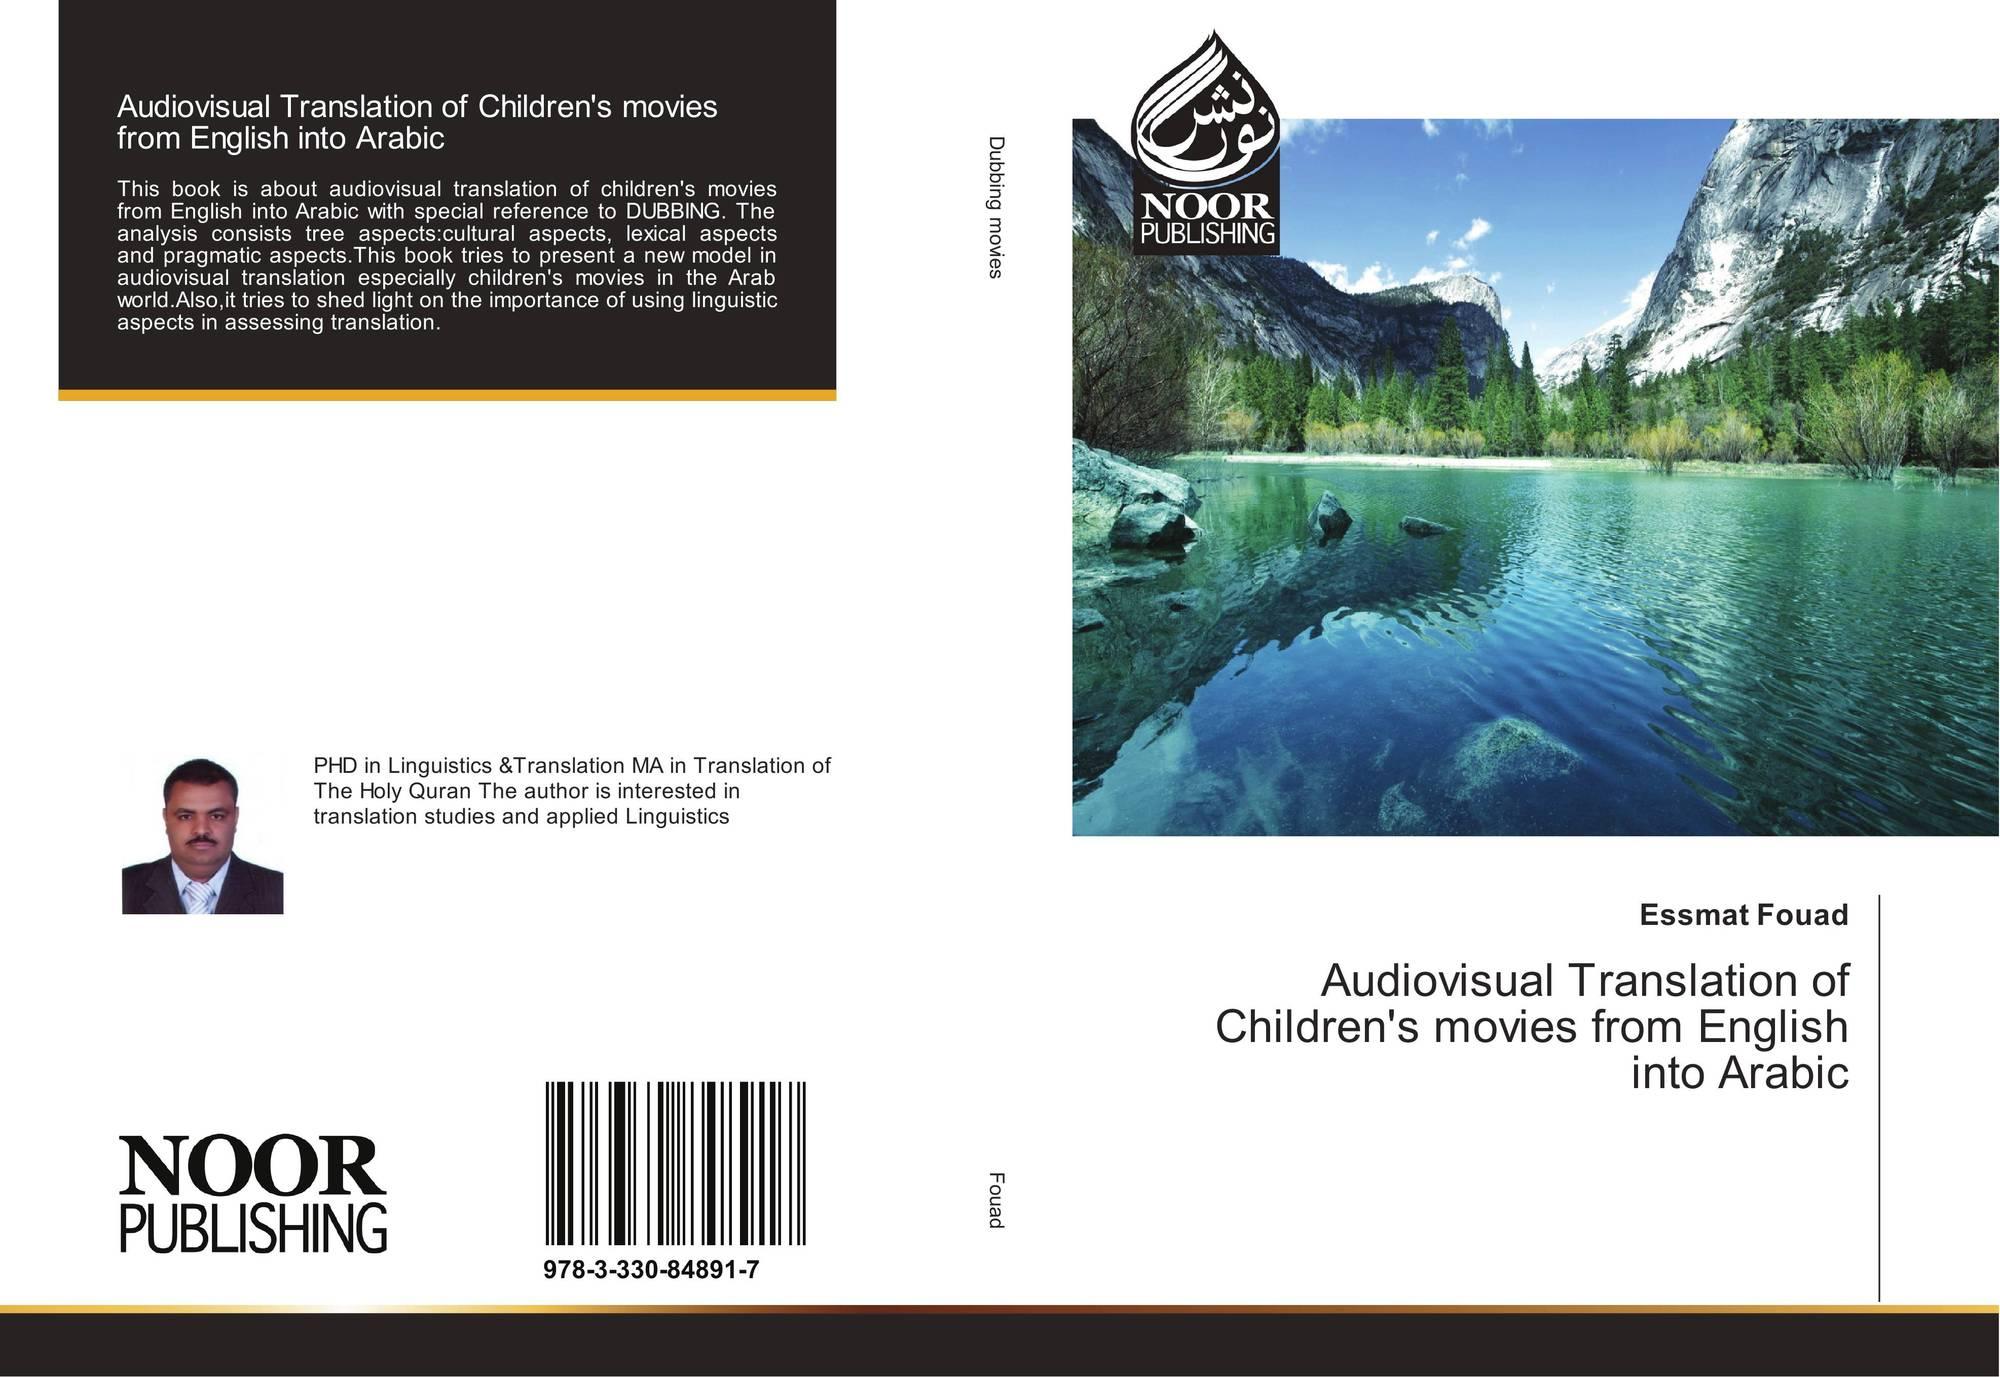 audiovisual translation movie translation essay